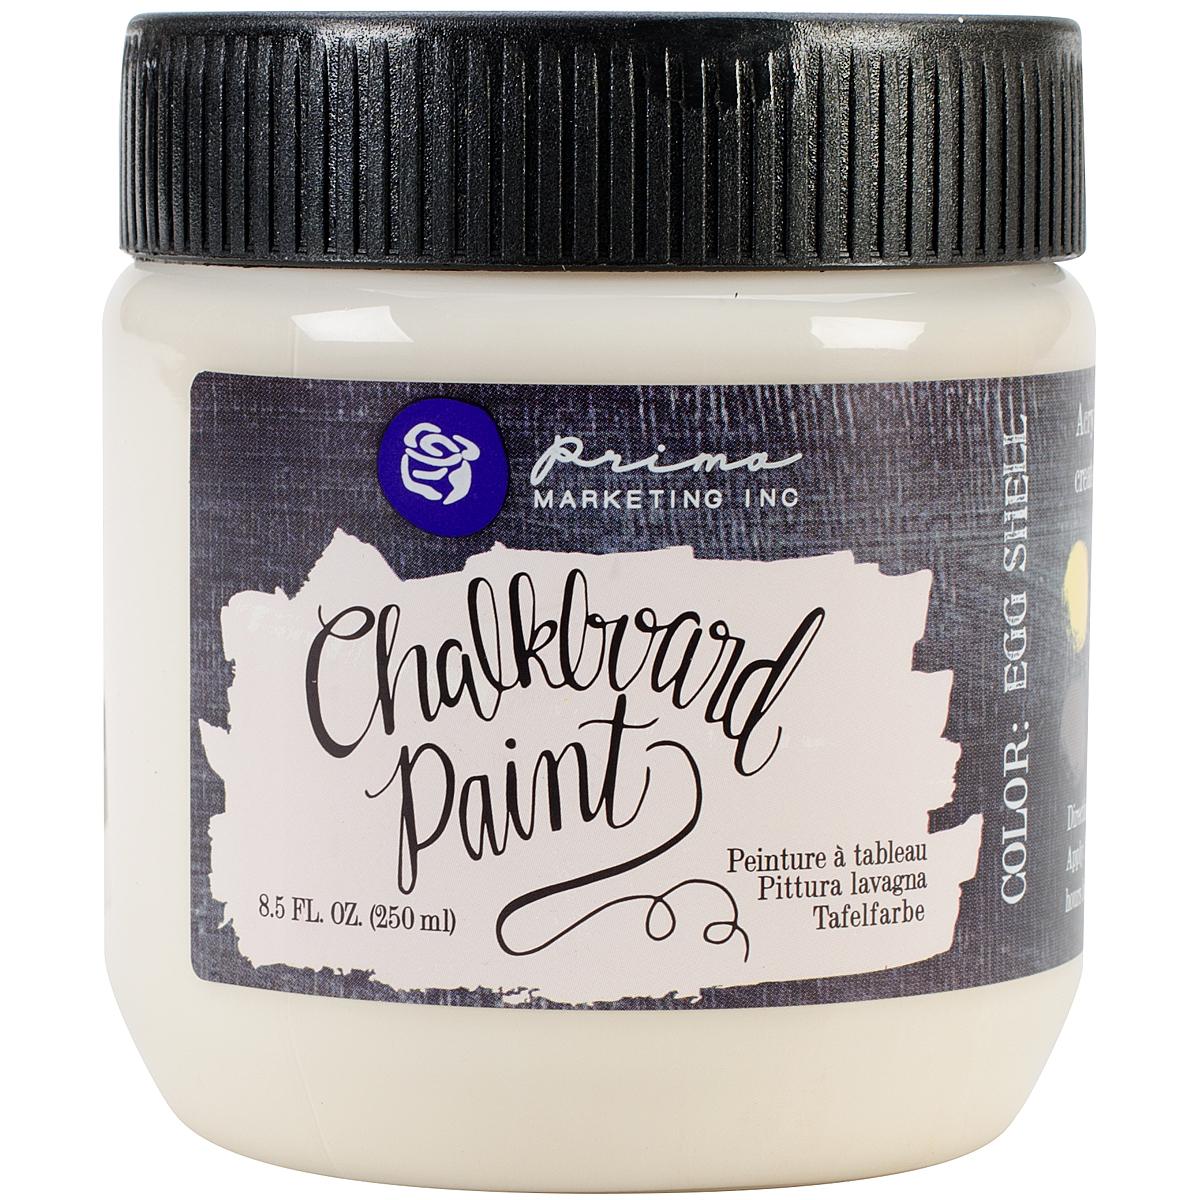 Prima Chalkboard Paint 8.5oz-Eggshell